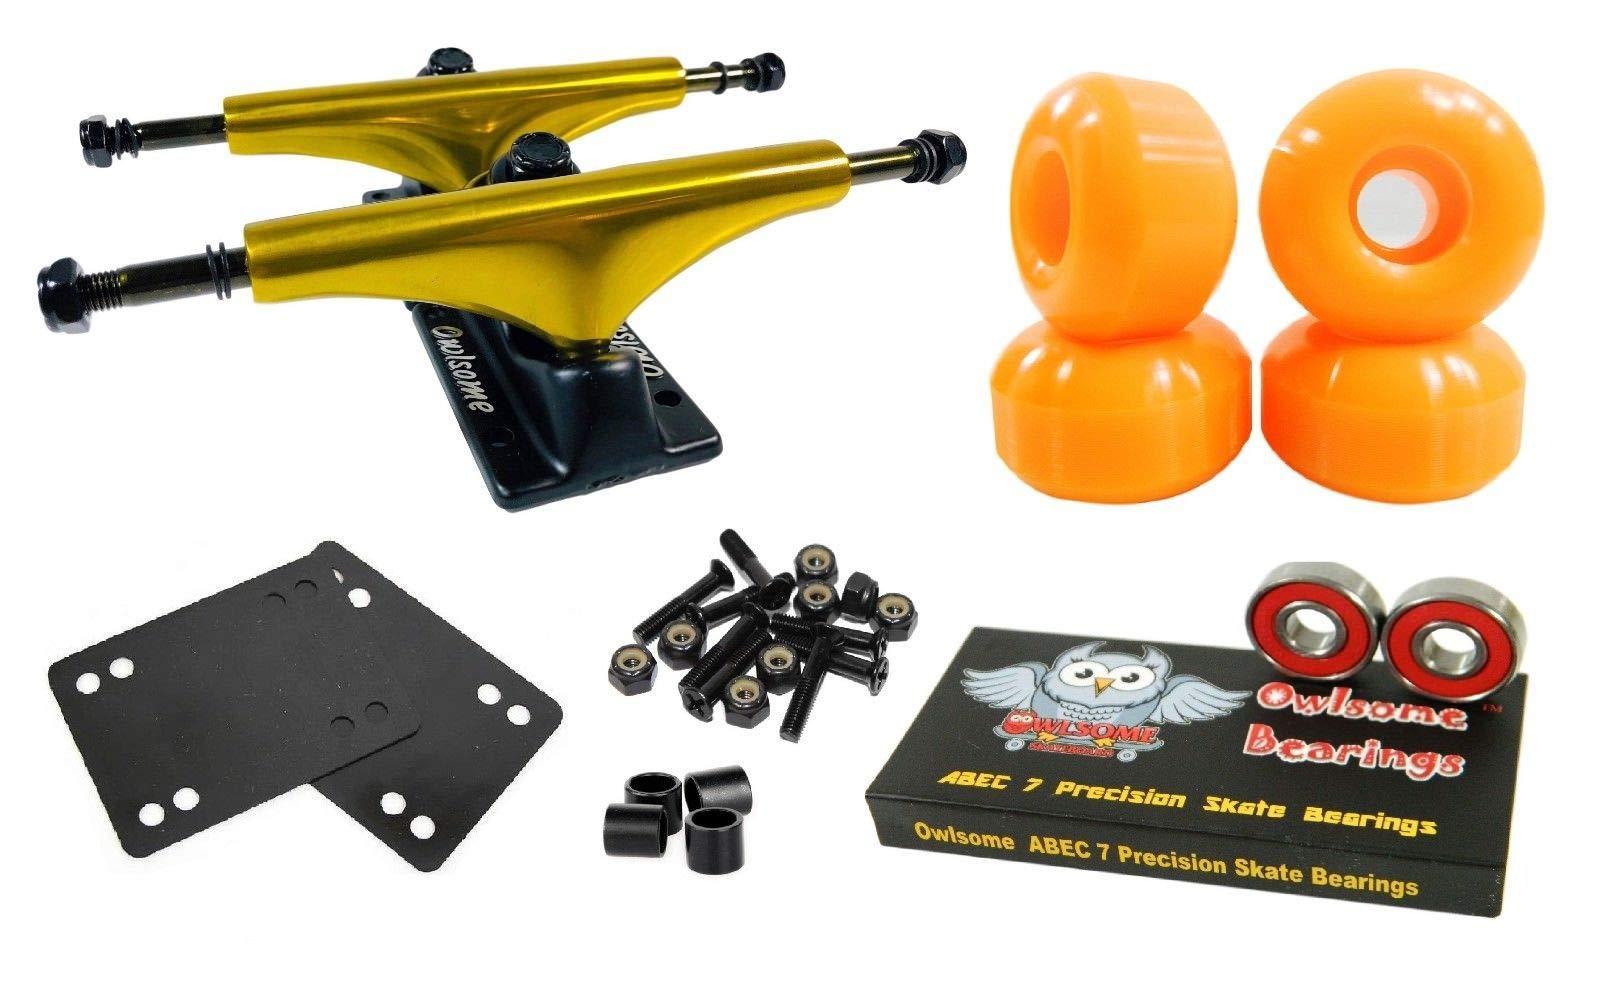 Orange 5.25 Gold/Blk Skateboard Trucks with 52Mm Wheels ABEC 7 Bearings Combo Set